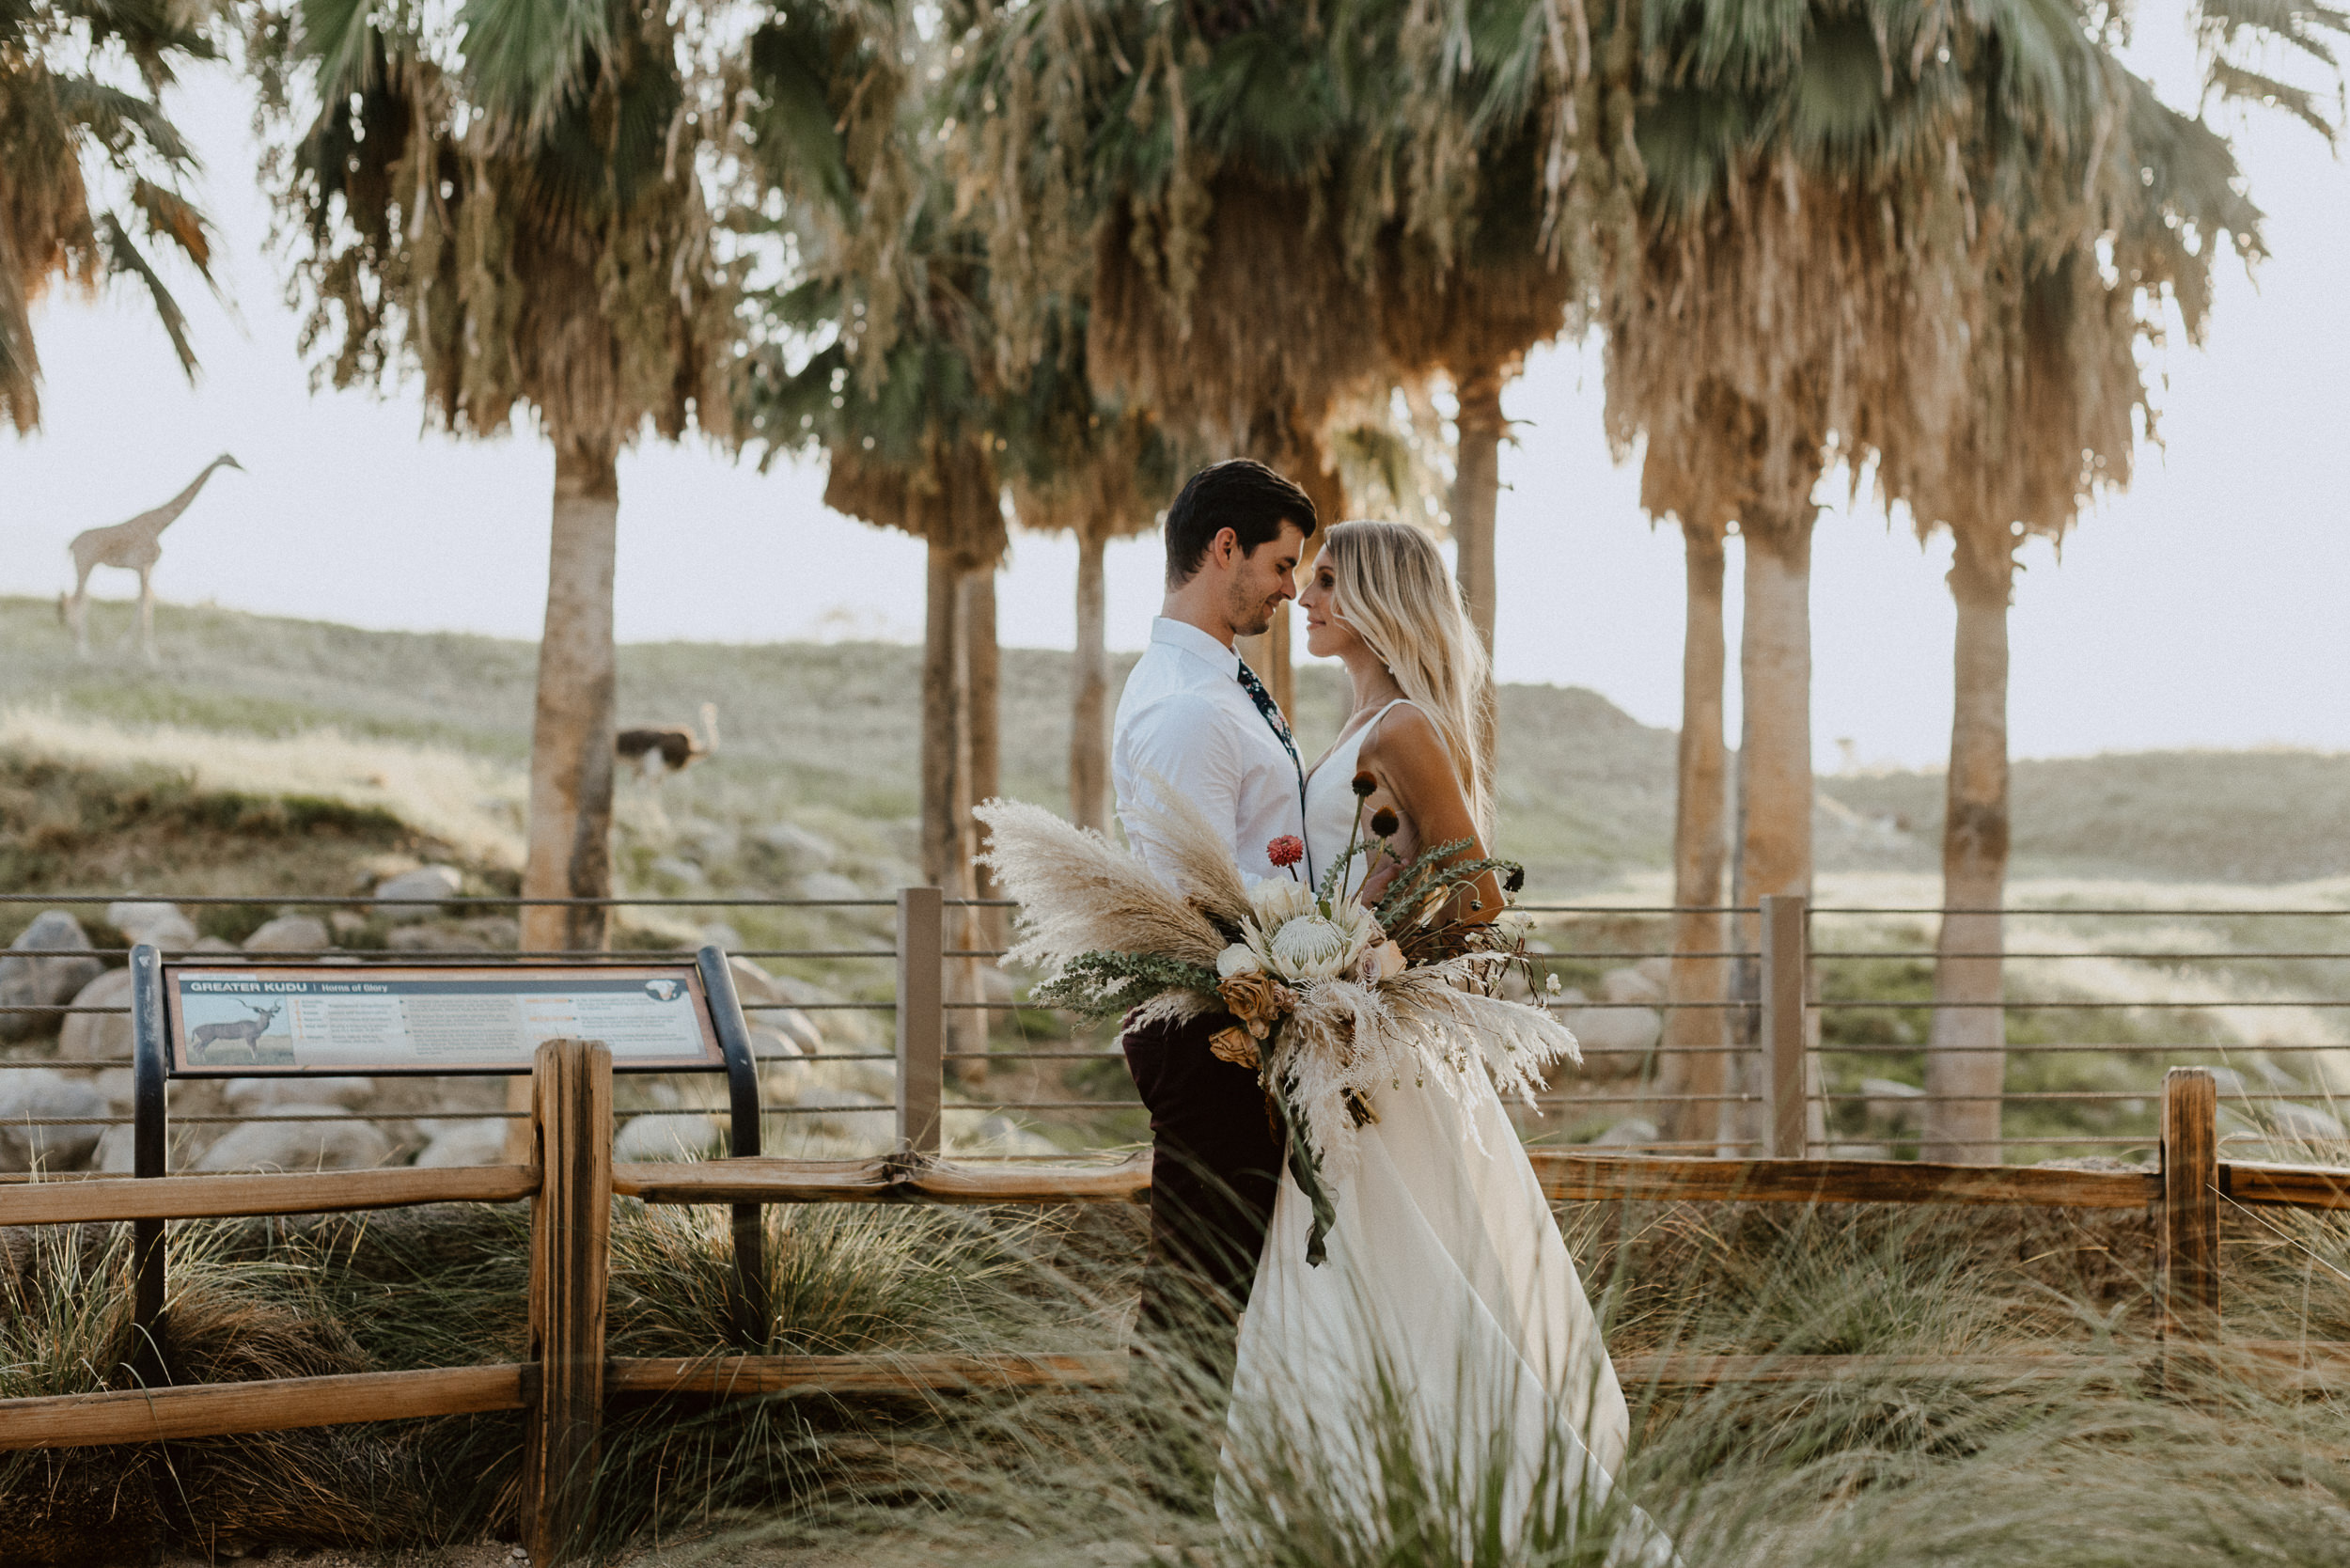 sChelsie + Chris - The Desert Shootout Wedding Romantics at The Living Desert-123.jpg